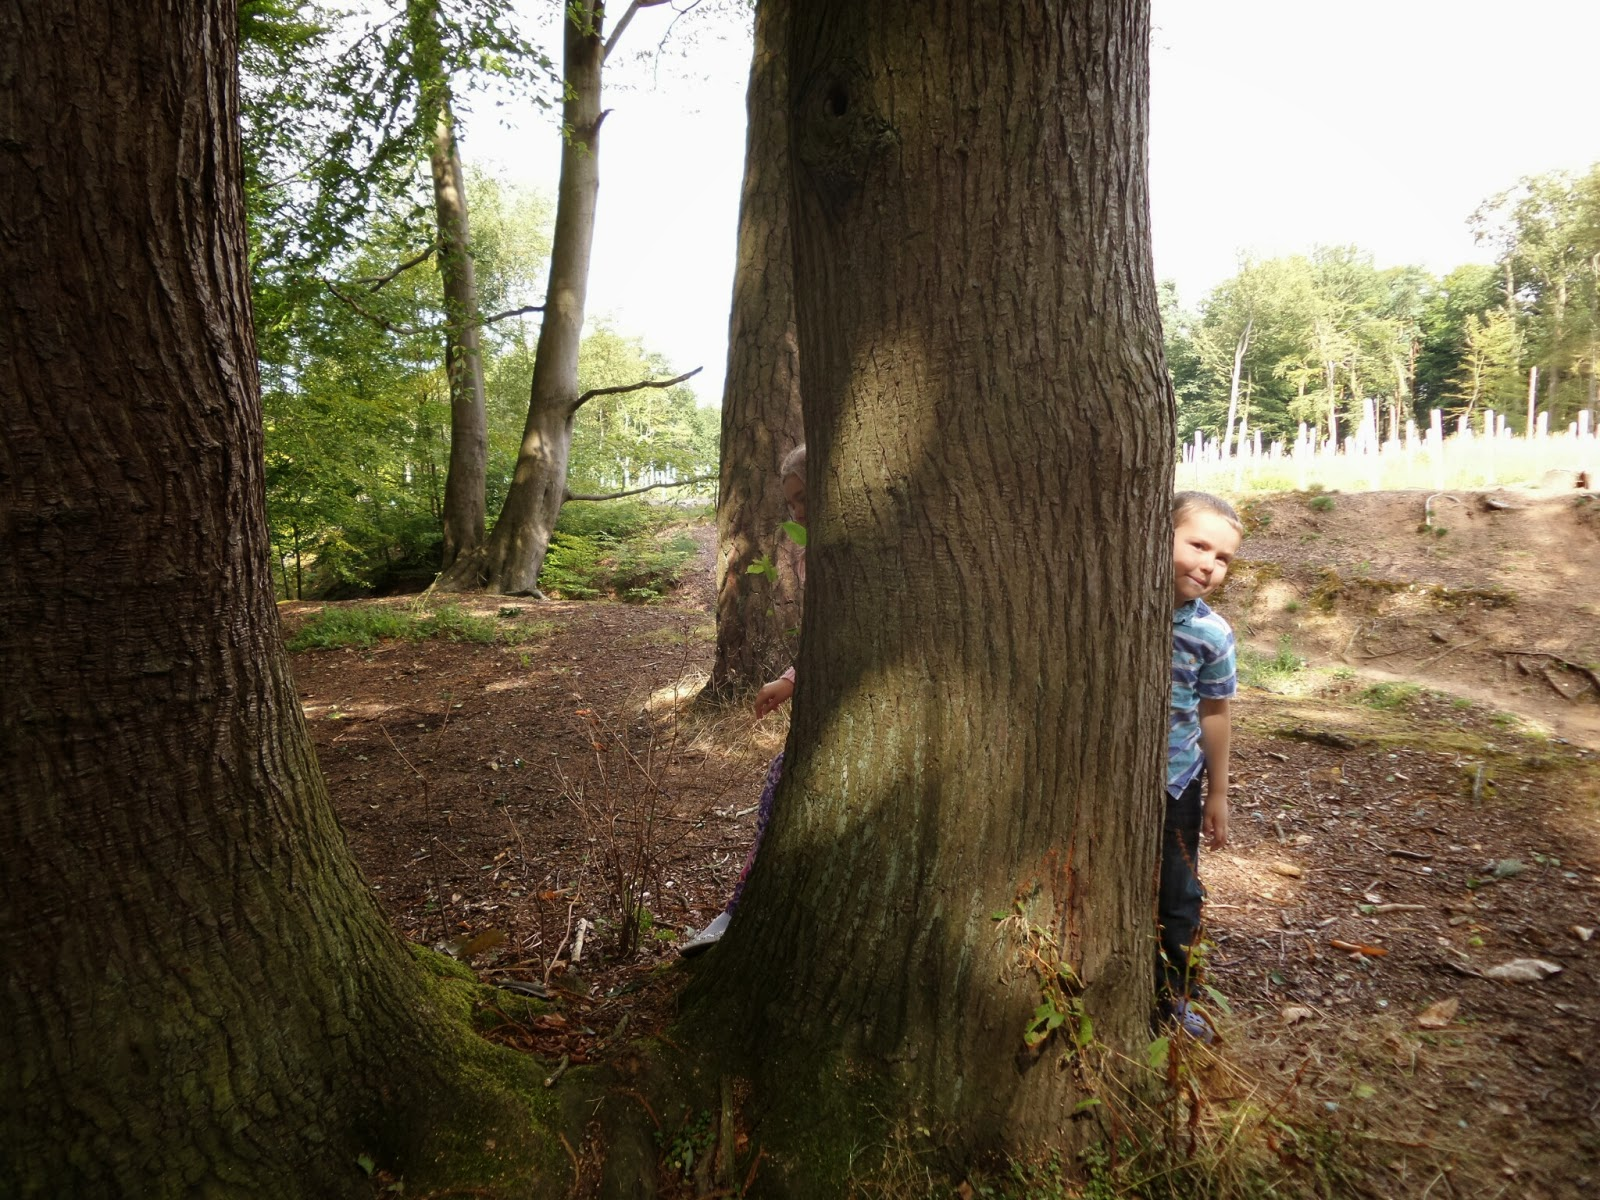 Top Ender and Big Boy hiding behind a Tree